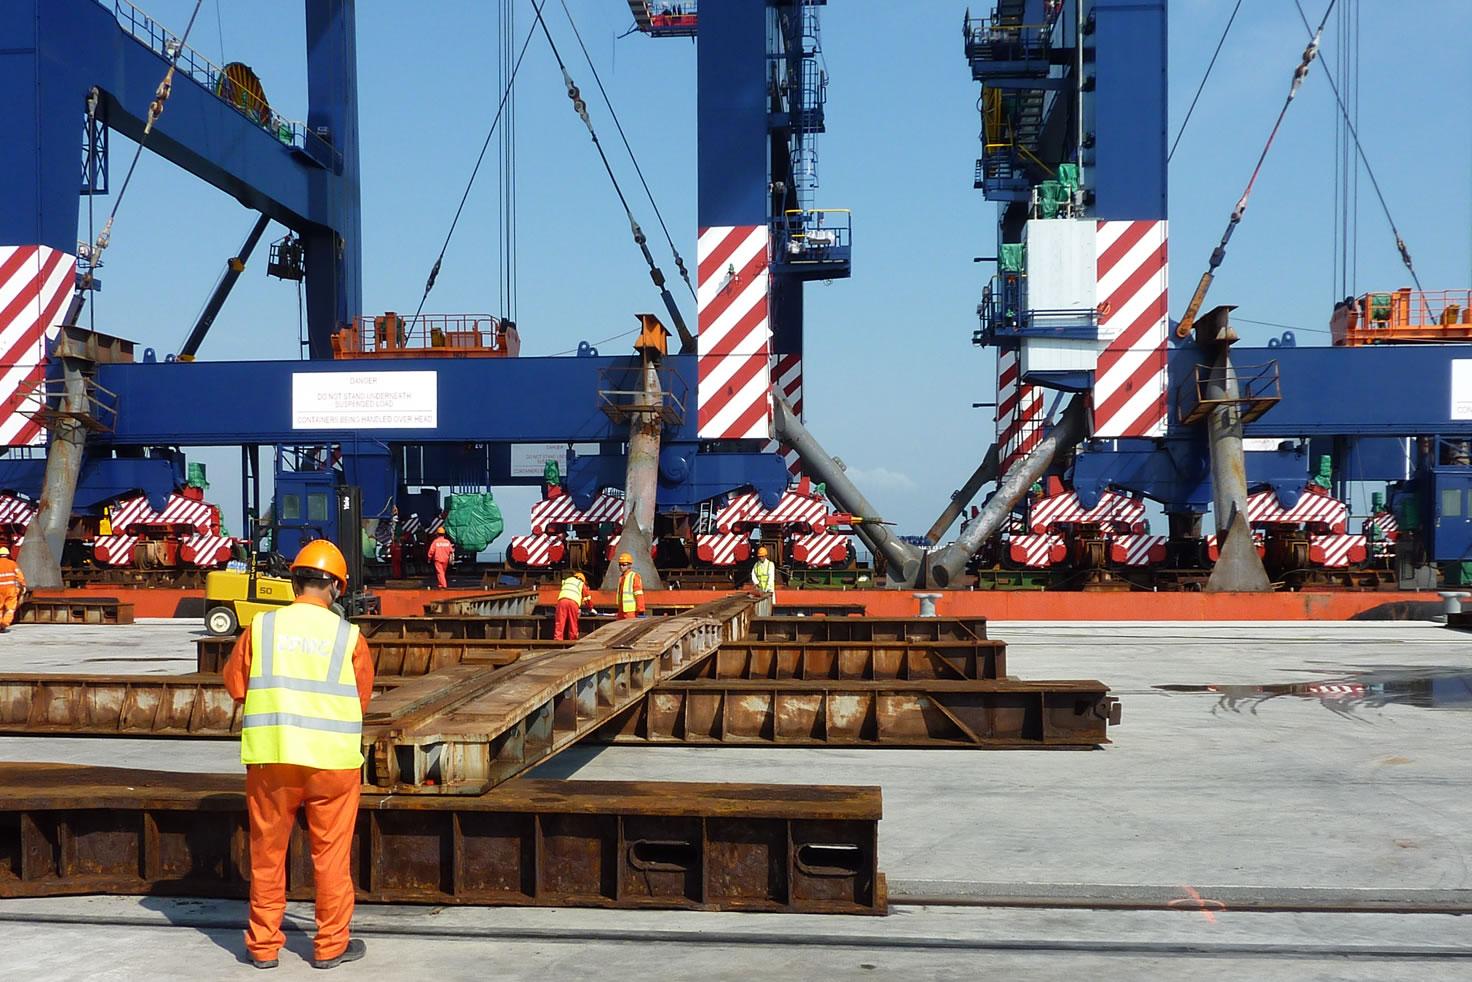 Kalmar Inver Australia Port Today